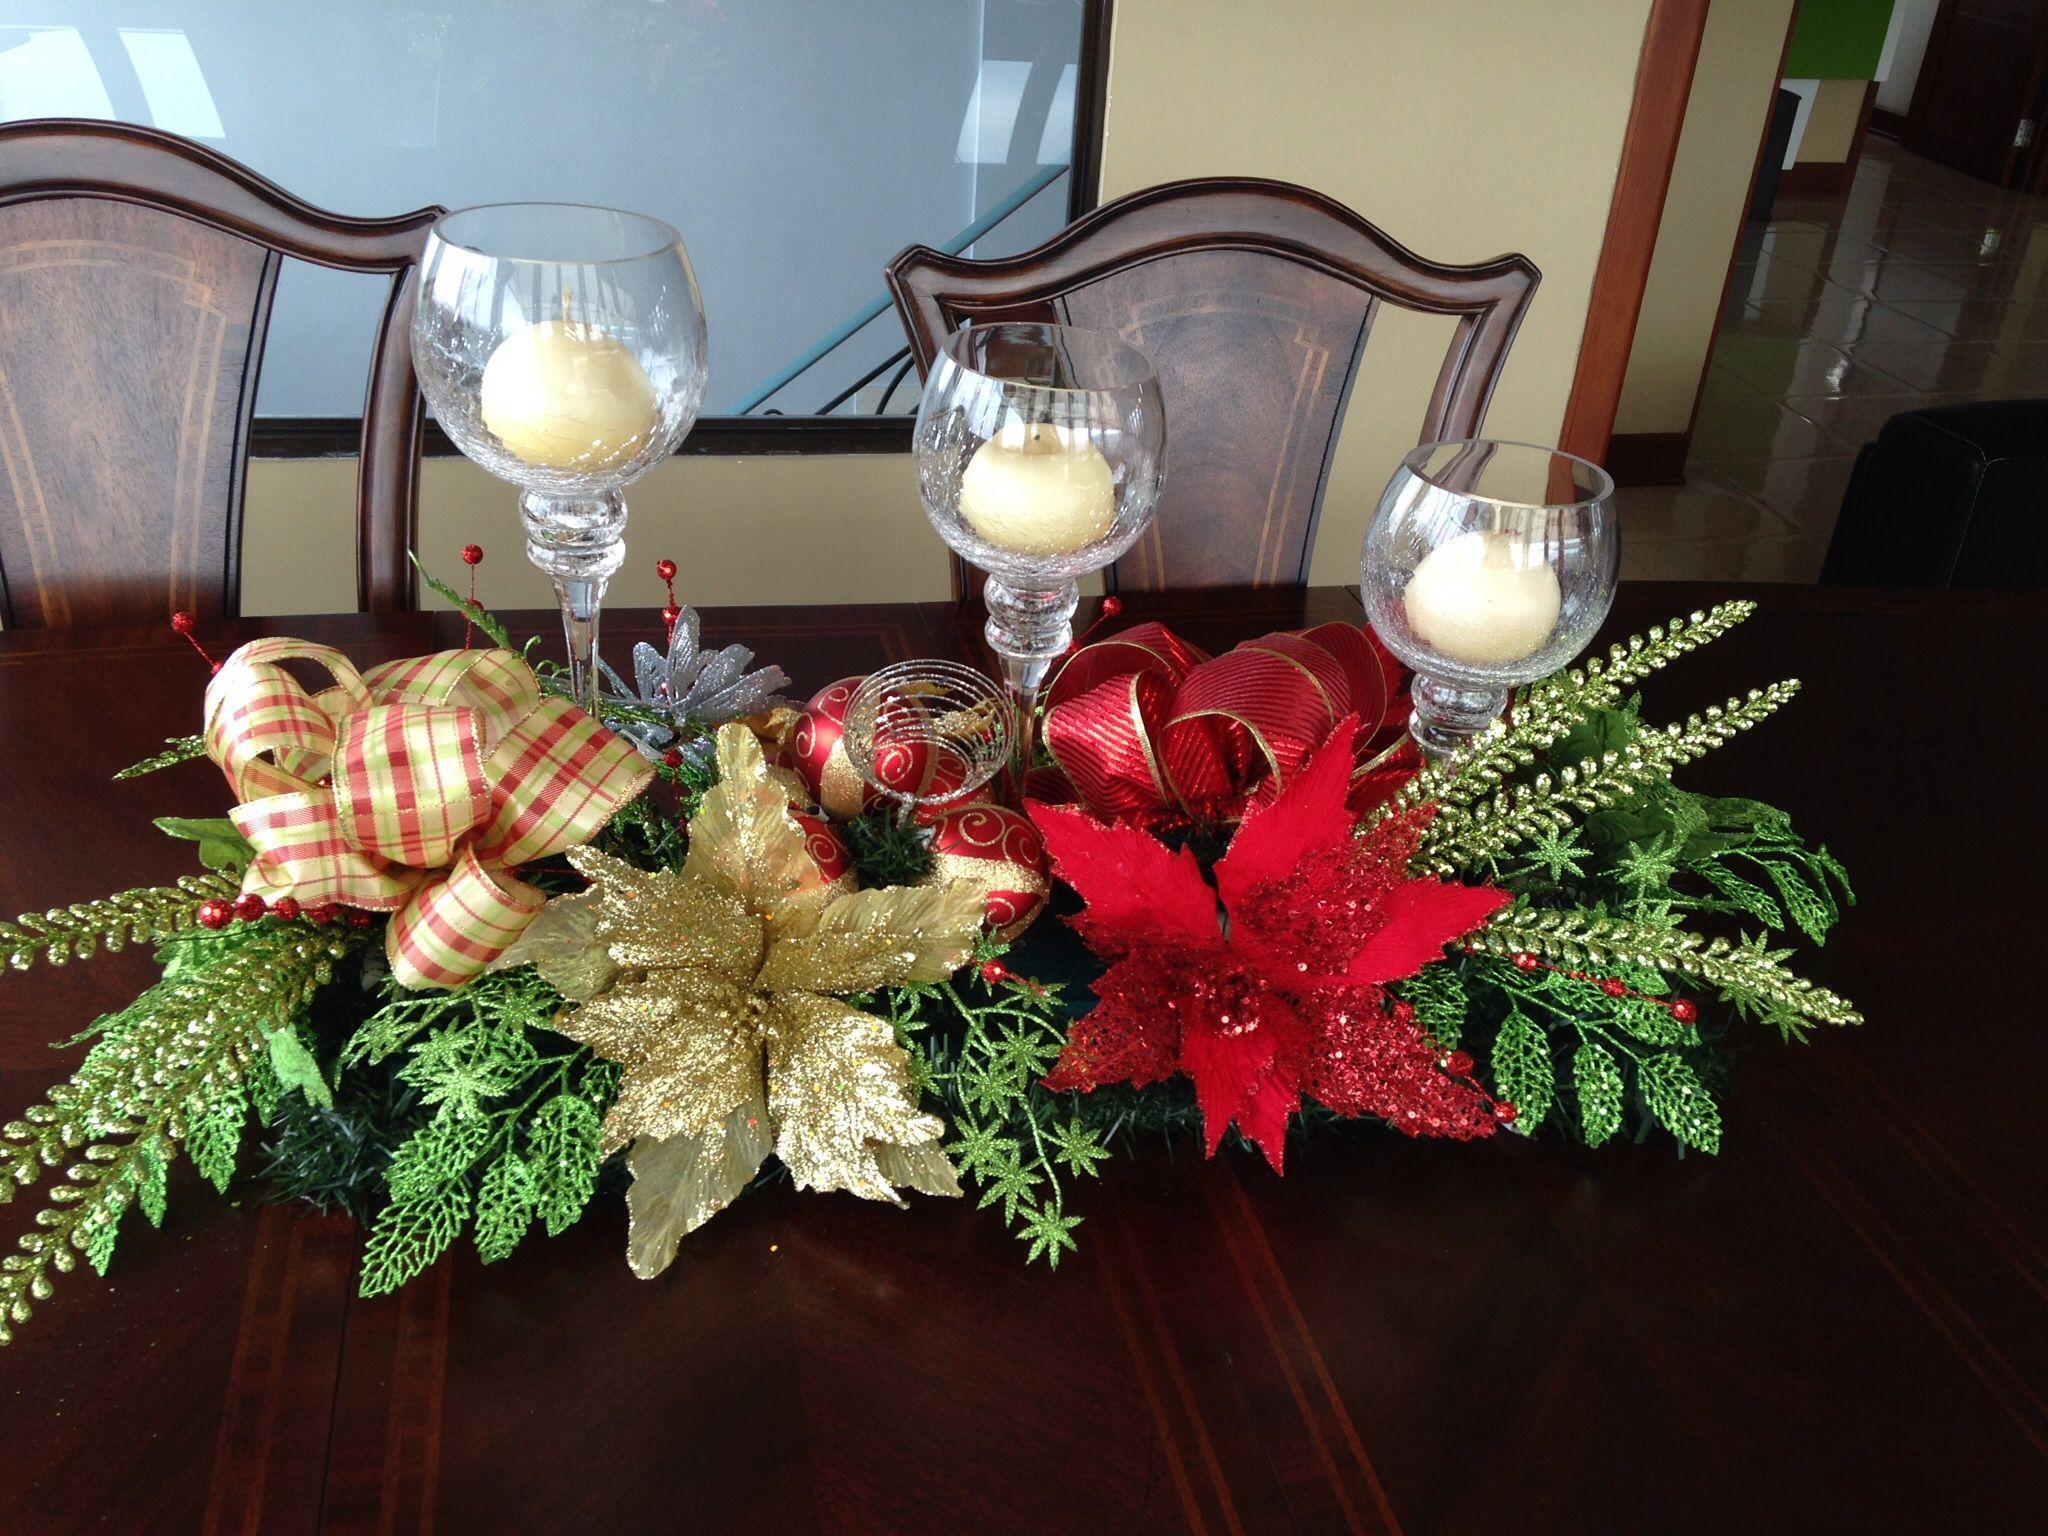 Centro mesa comedor navidad pinterest comedores - Arreglos navidenos para mesa ...